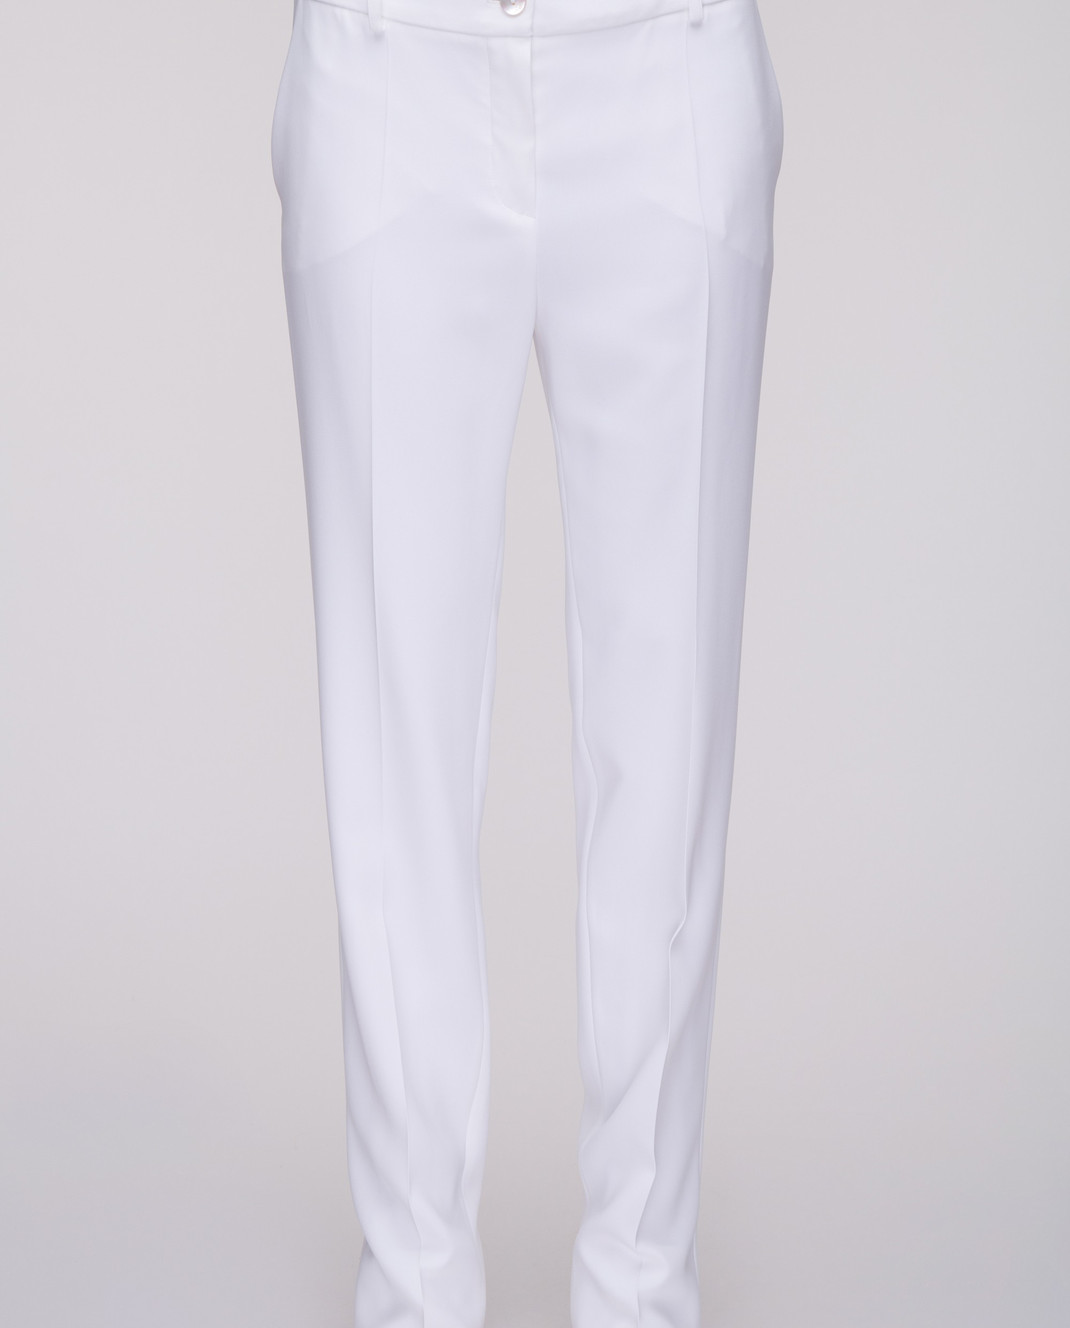 Blumarine Белые брюки 6359 изображение 3